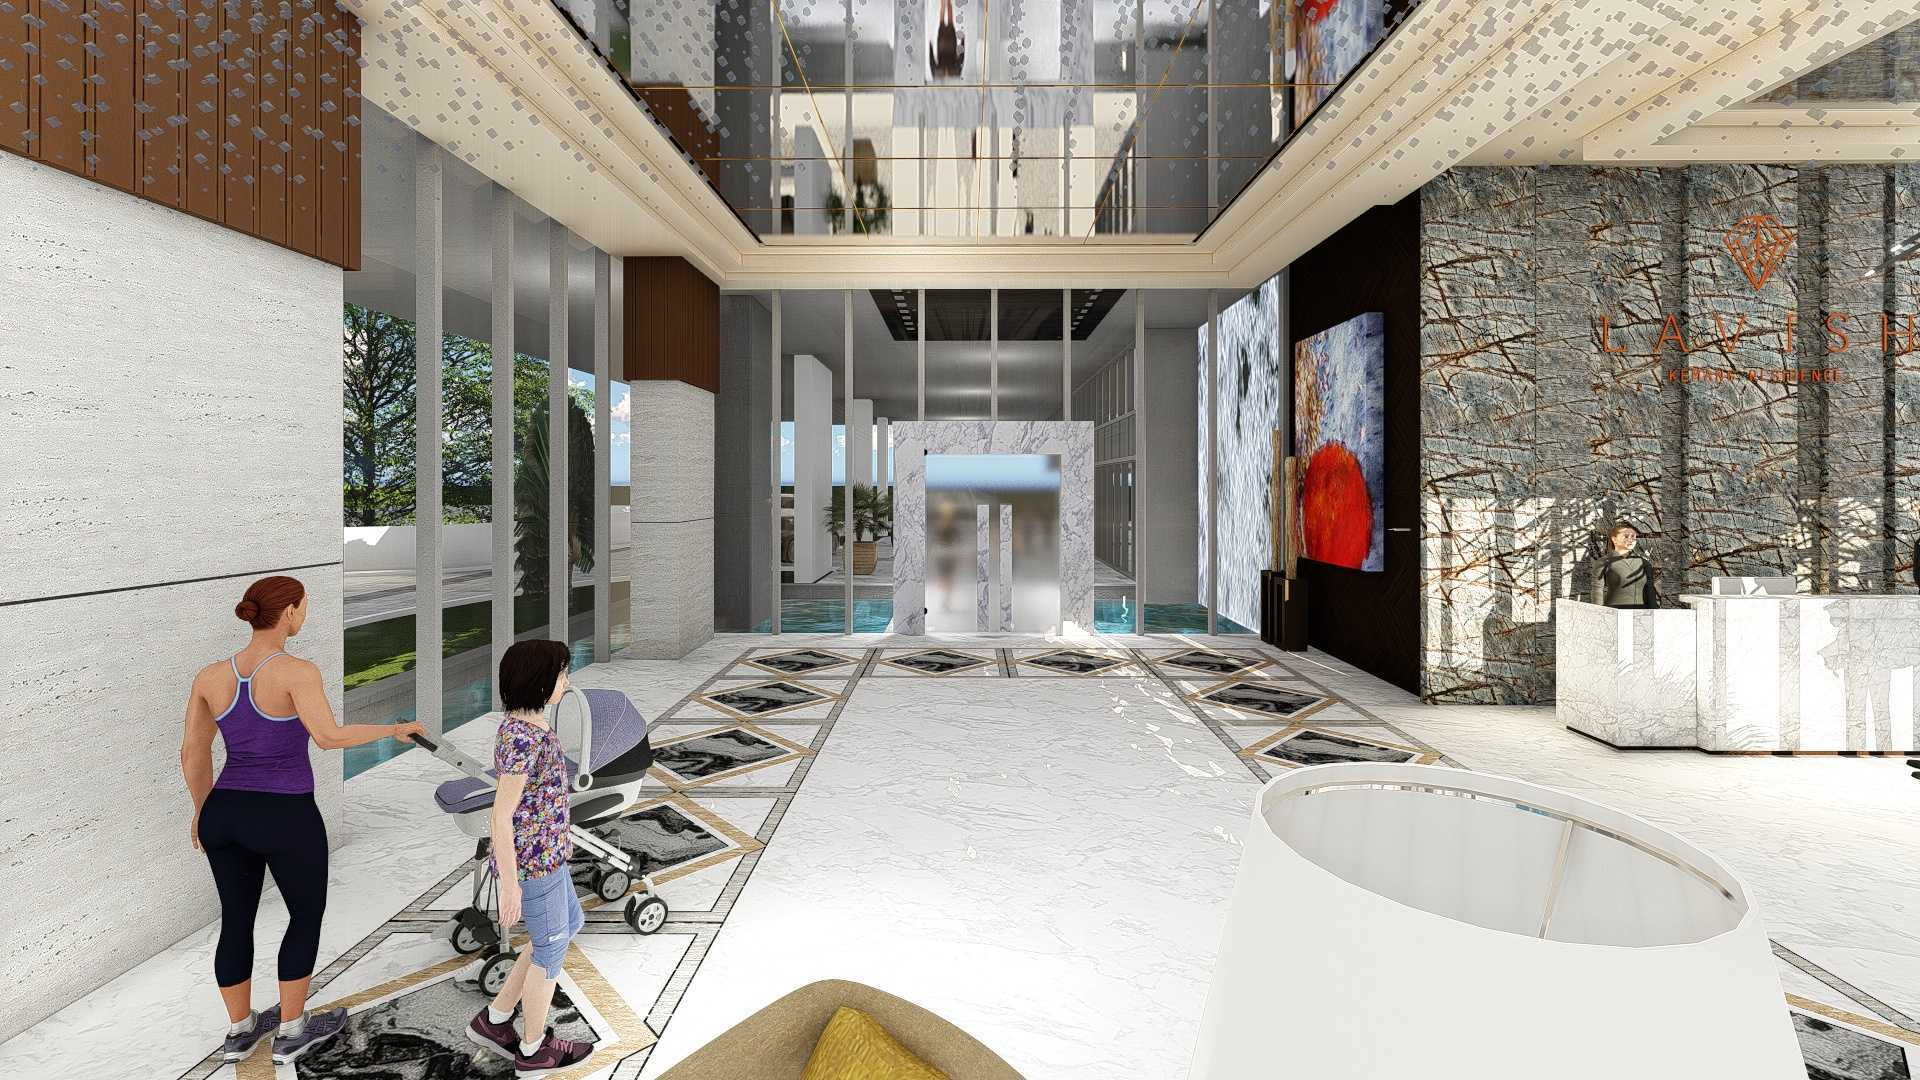 Samitrayasa Design Luxury Design Alternative 2 Jl. Kemang Raya, Bangka, Mampang Prpt., Kota Jakarta Selatan, Daerah Khusus Ibukota Jakarta, Indonesia  102 Modern  32650